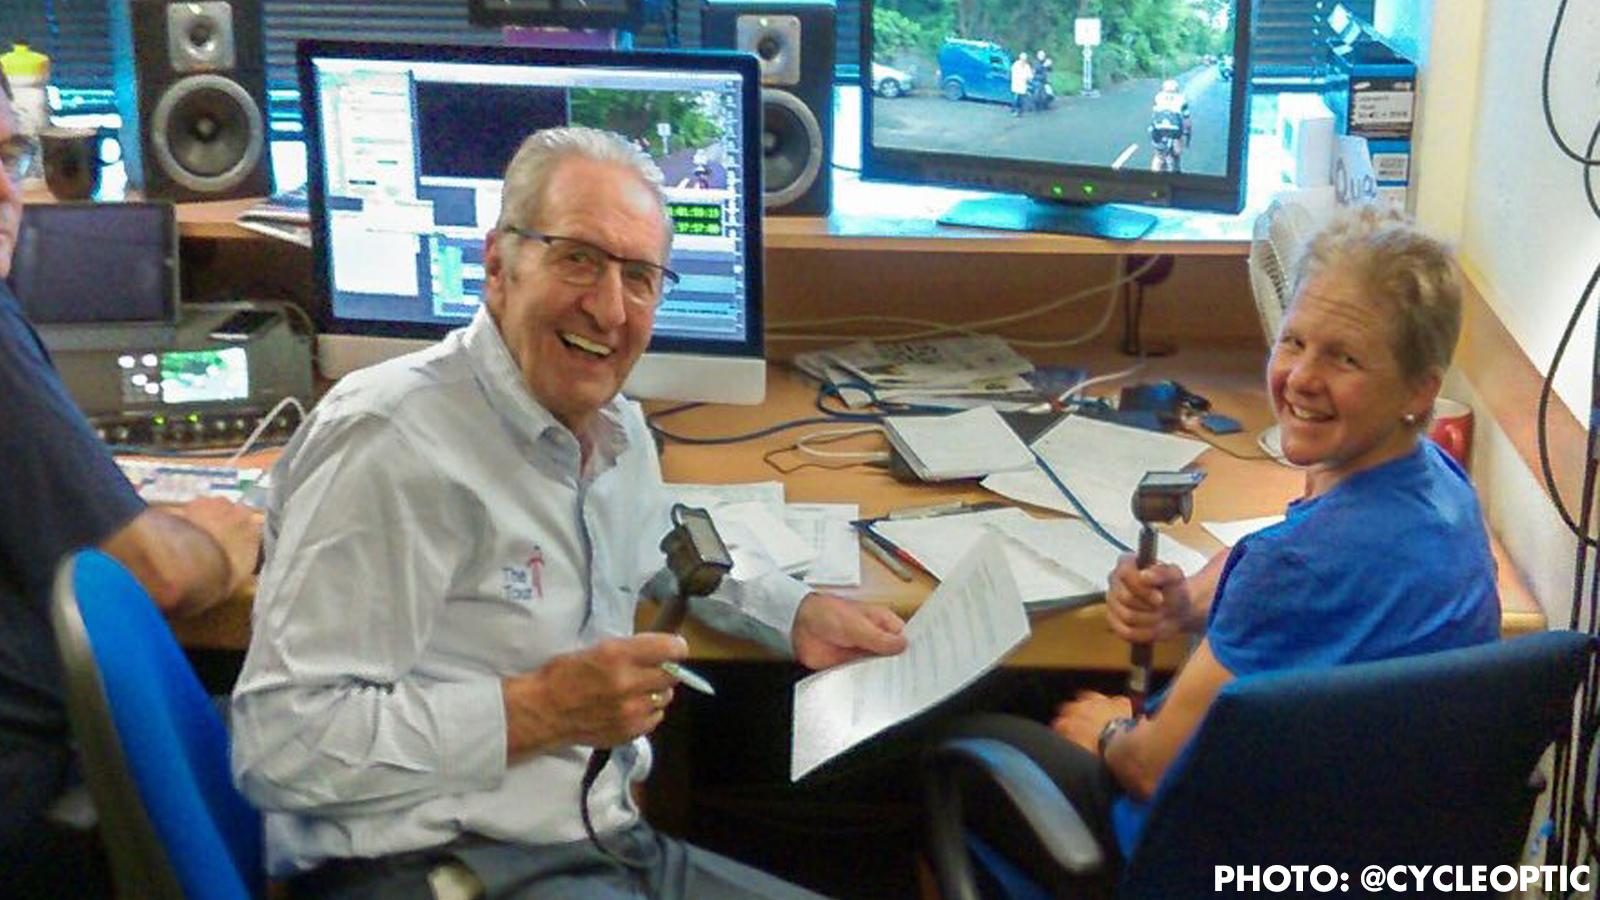 Sharon Laws ITV4 Women's Tour commentator